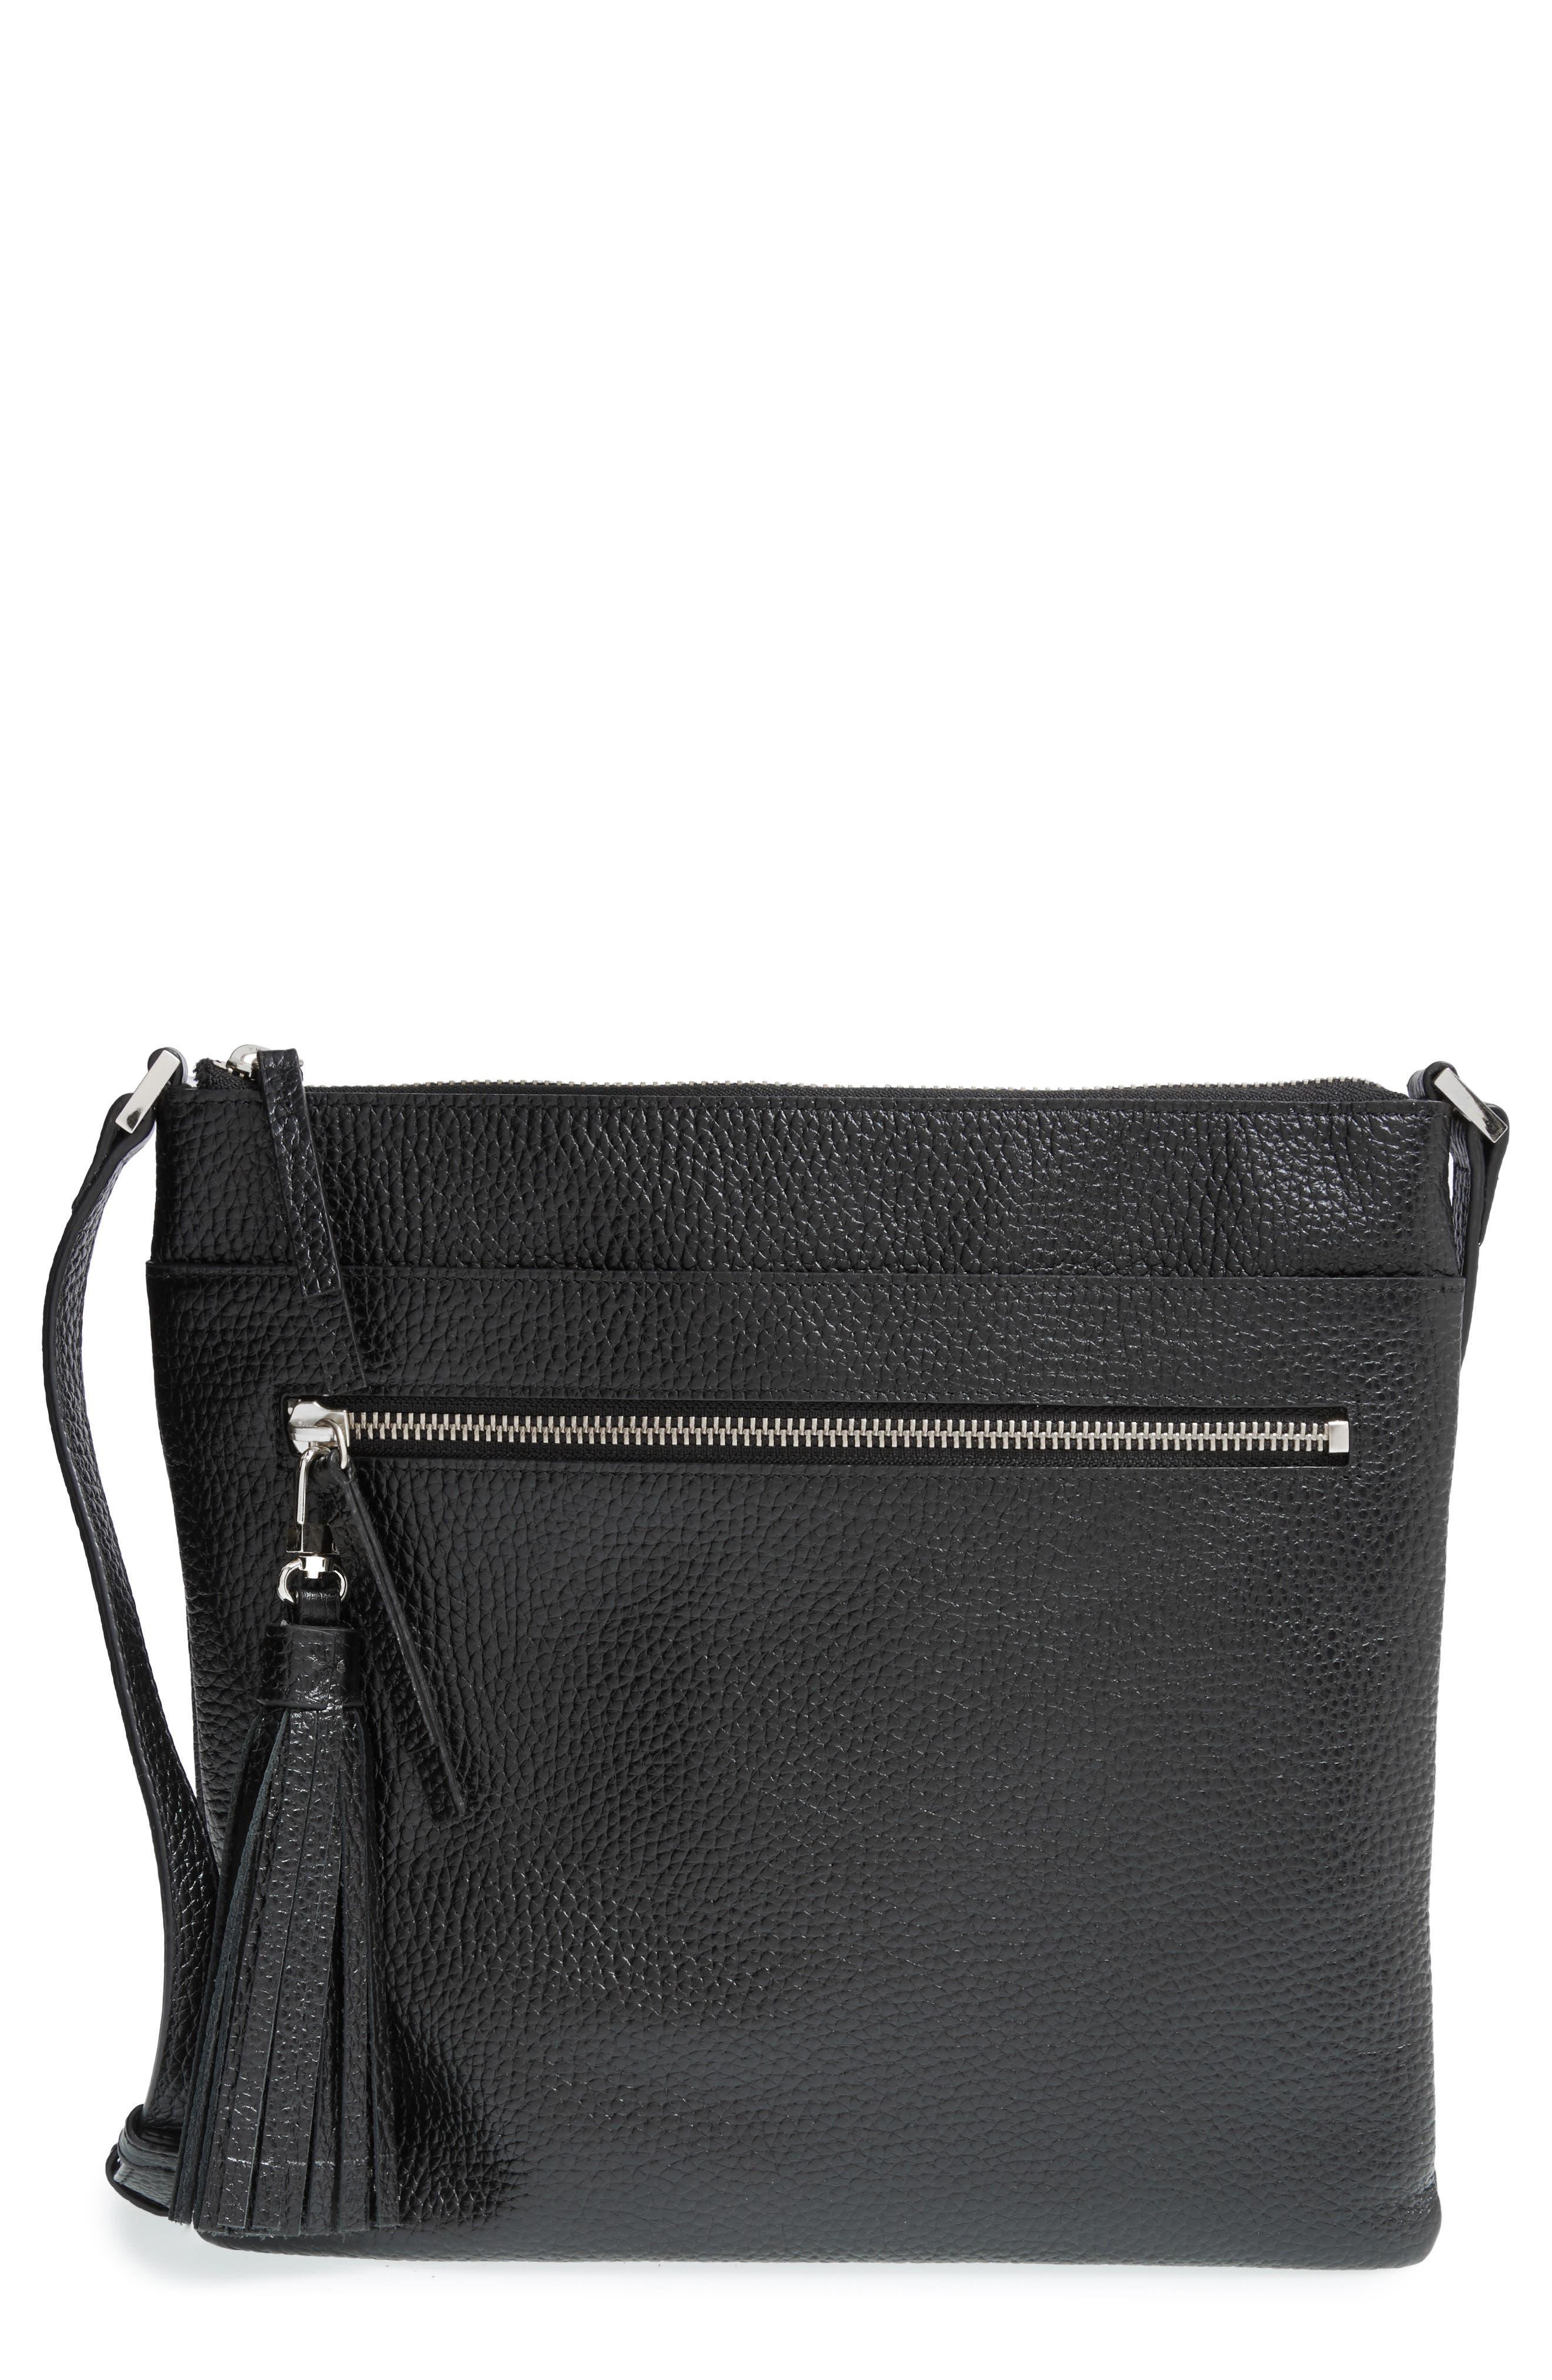 HALOGEN<SUP>®</SUP>, Tasseled Leather Crossbody Bag, Alternate thumbnail 2, color, 001